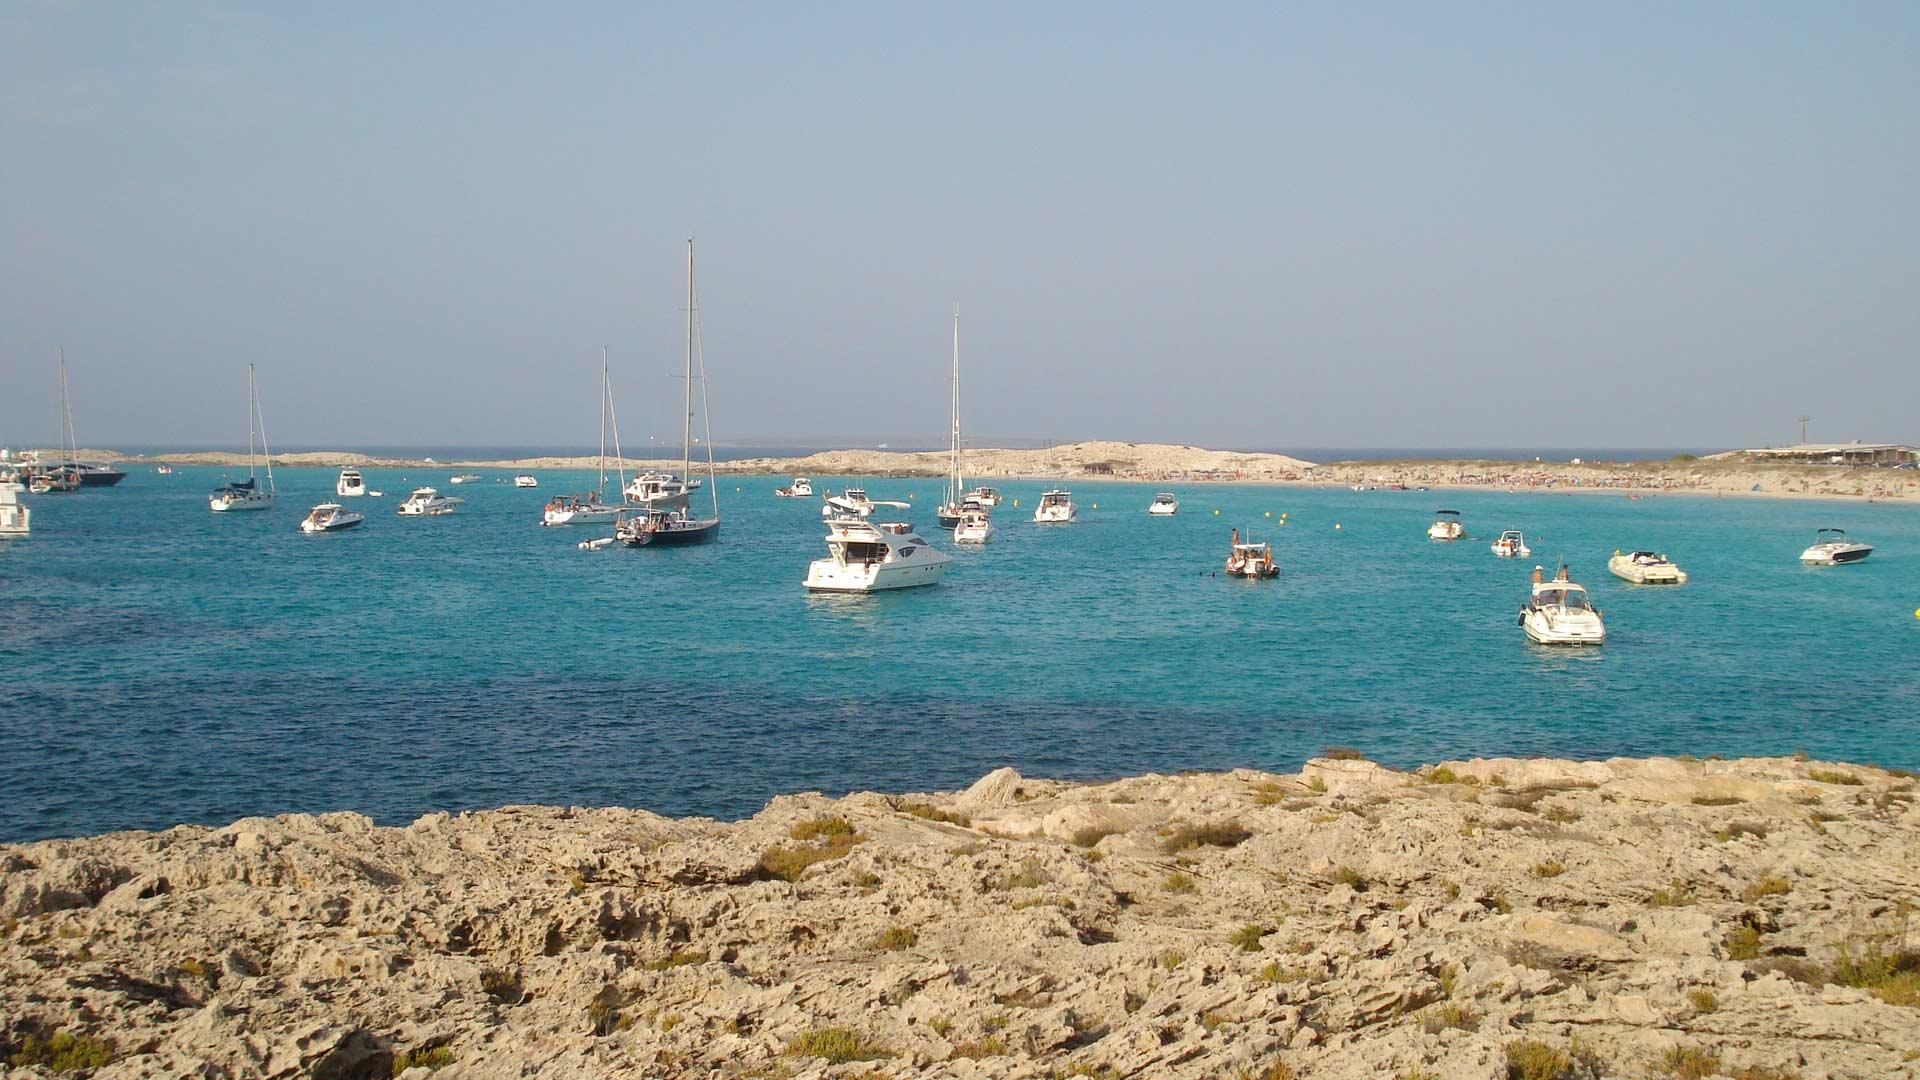 Appartamenti Vacanze Formentera